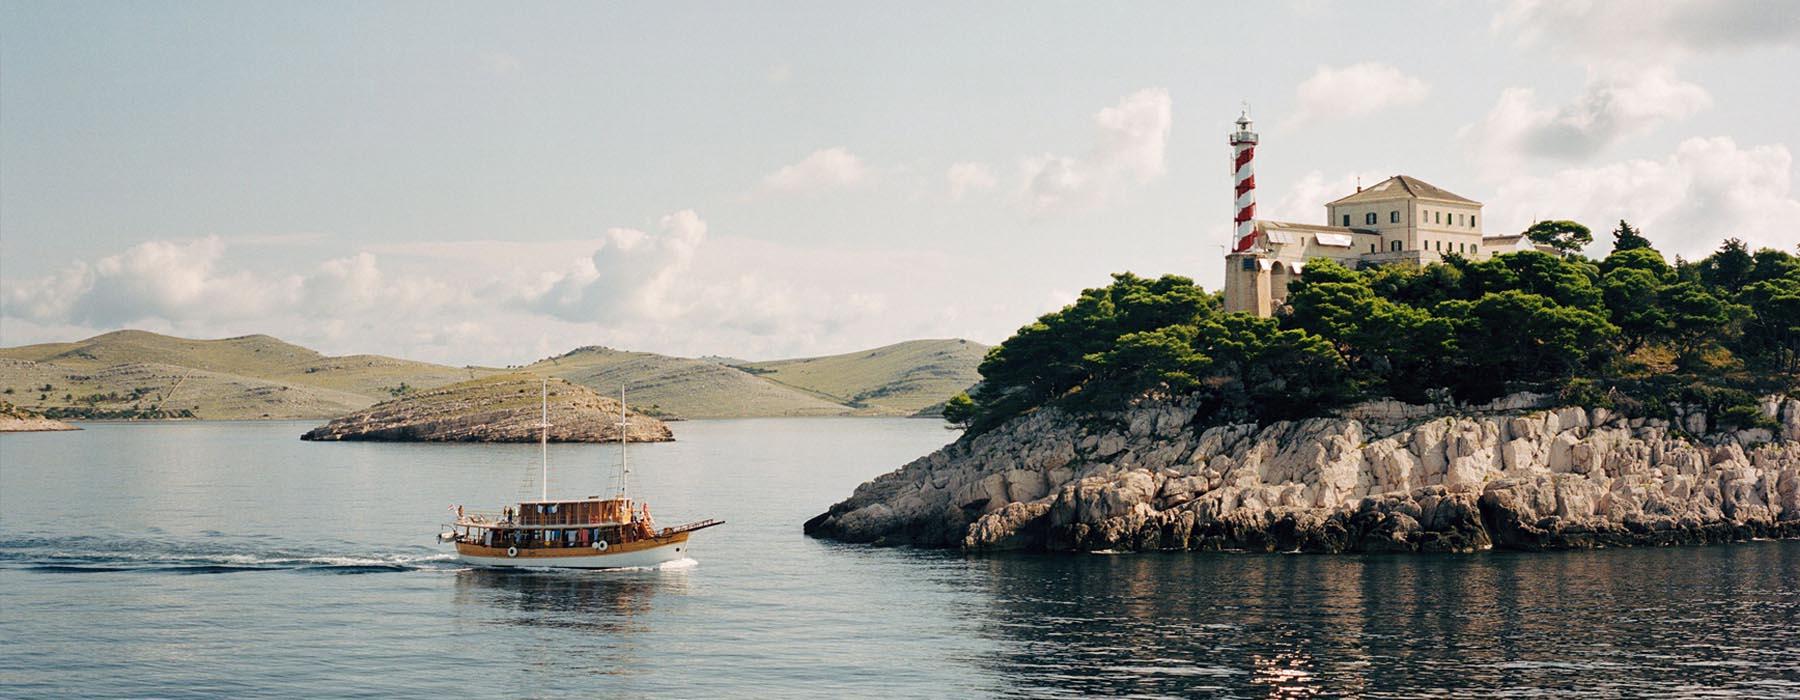 Croatie Carte Identite.Formalites Voyage Croatie Passeport Et Visa Voyageurs Du Monde